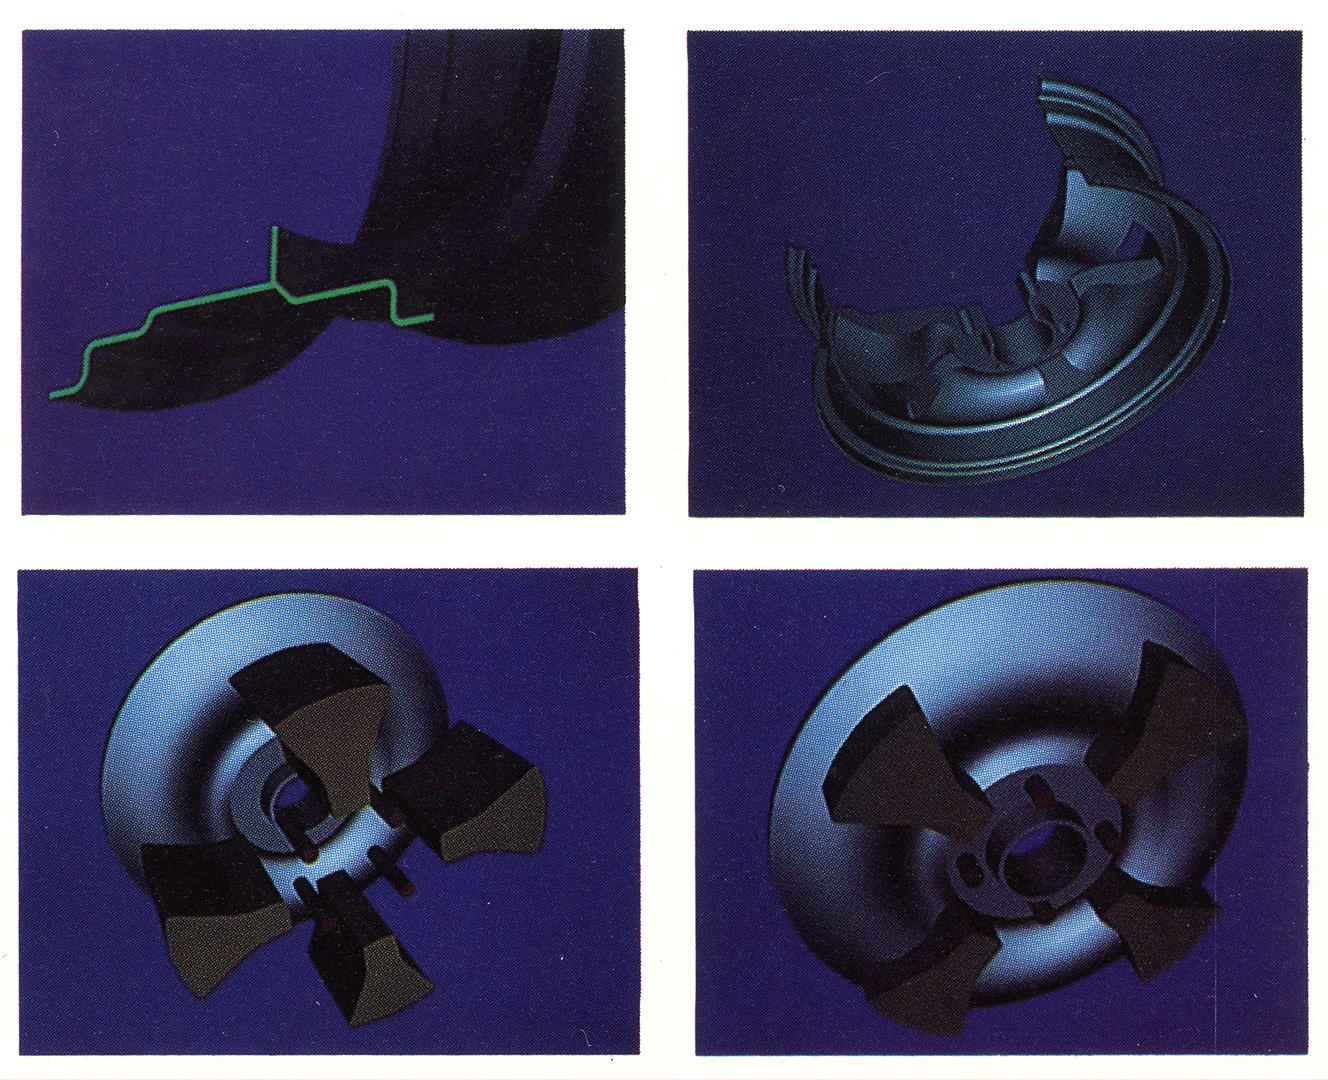 ©, PDA Engineering and C. Hayden Hamilton, Aluminum Wheel Modeling